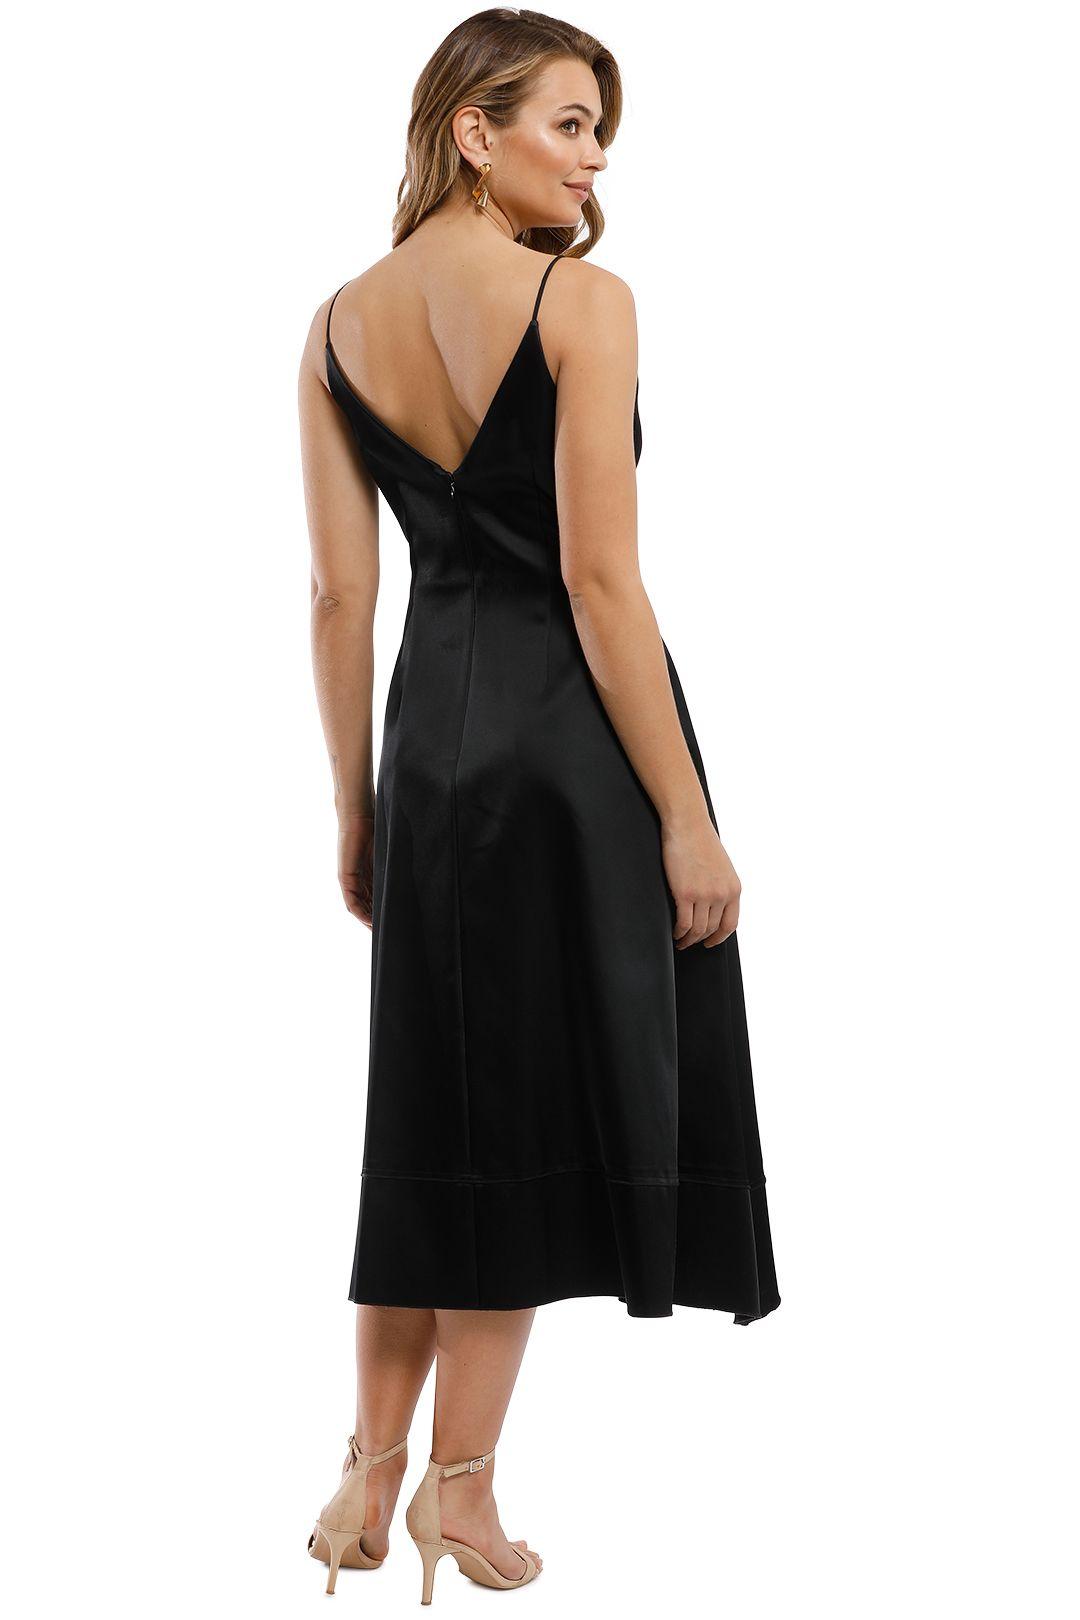 Nicholas - Duchess Satin Ball Dress - Black - Back